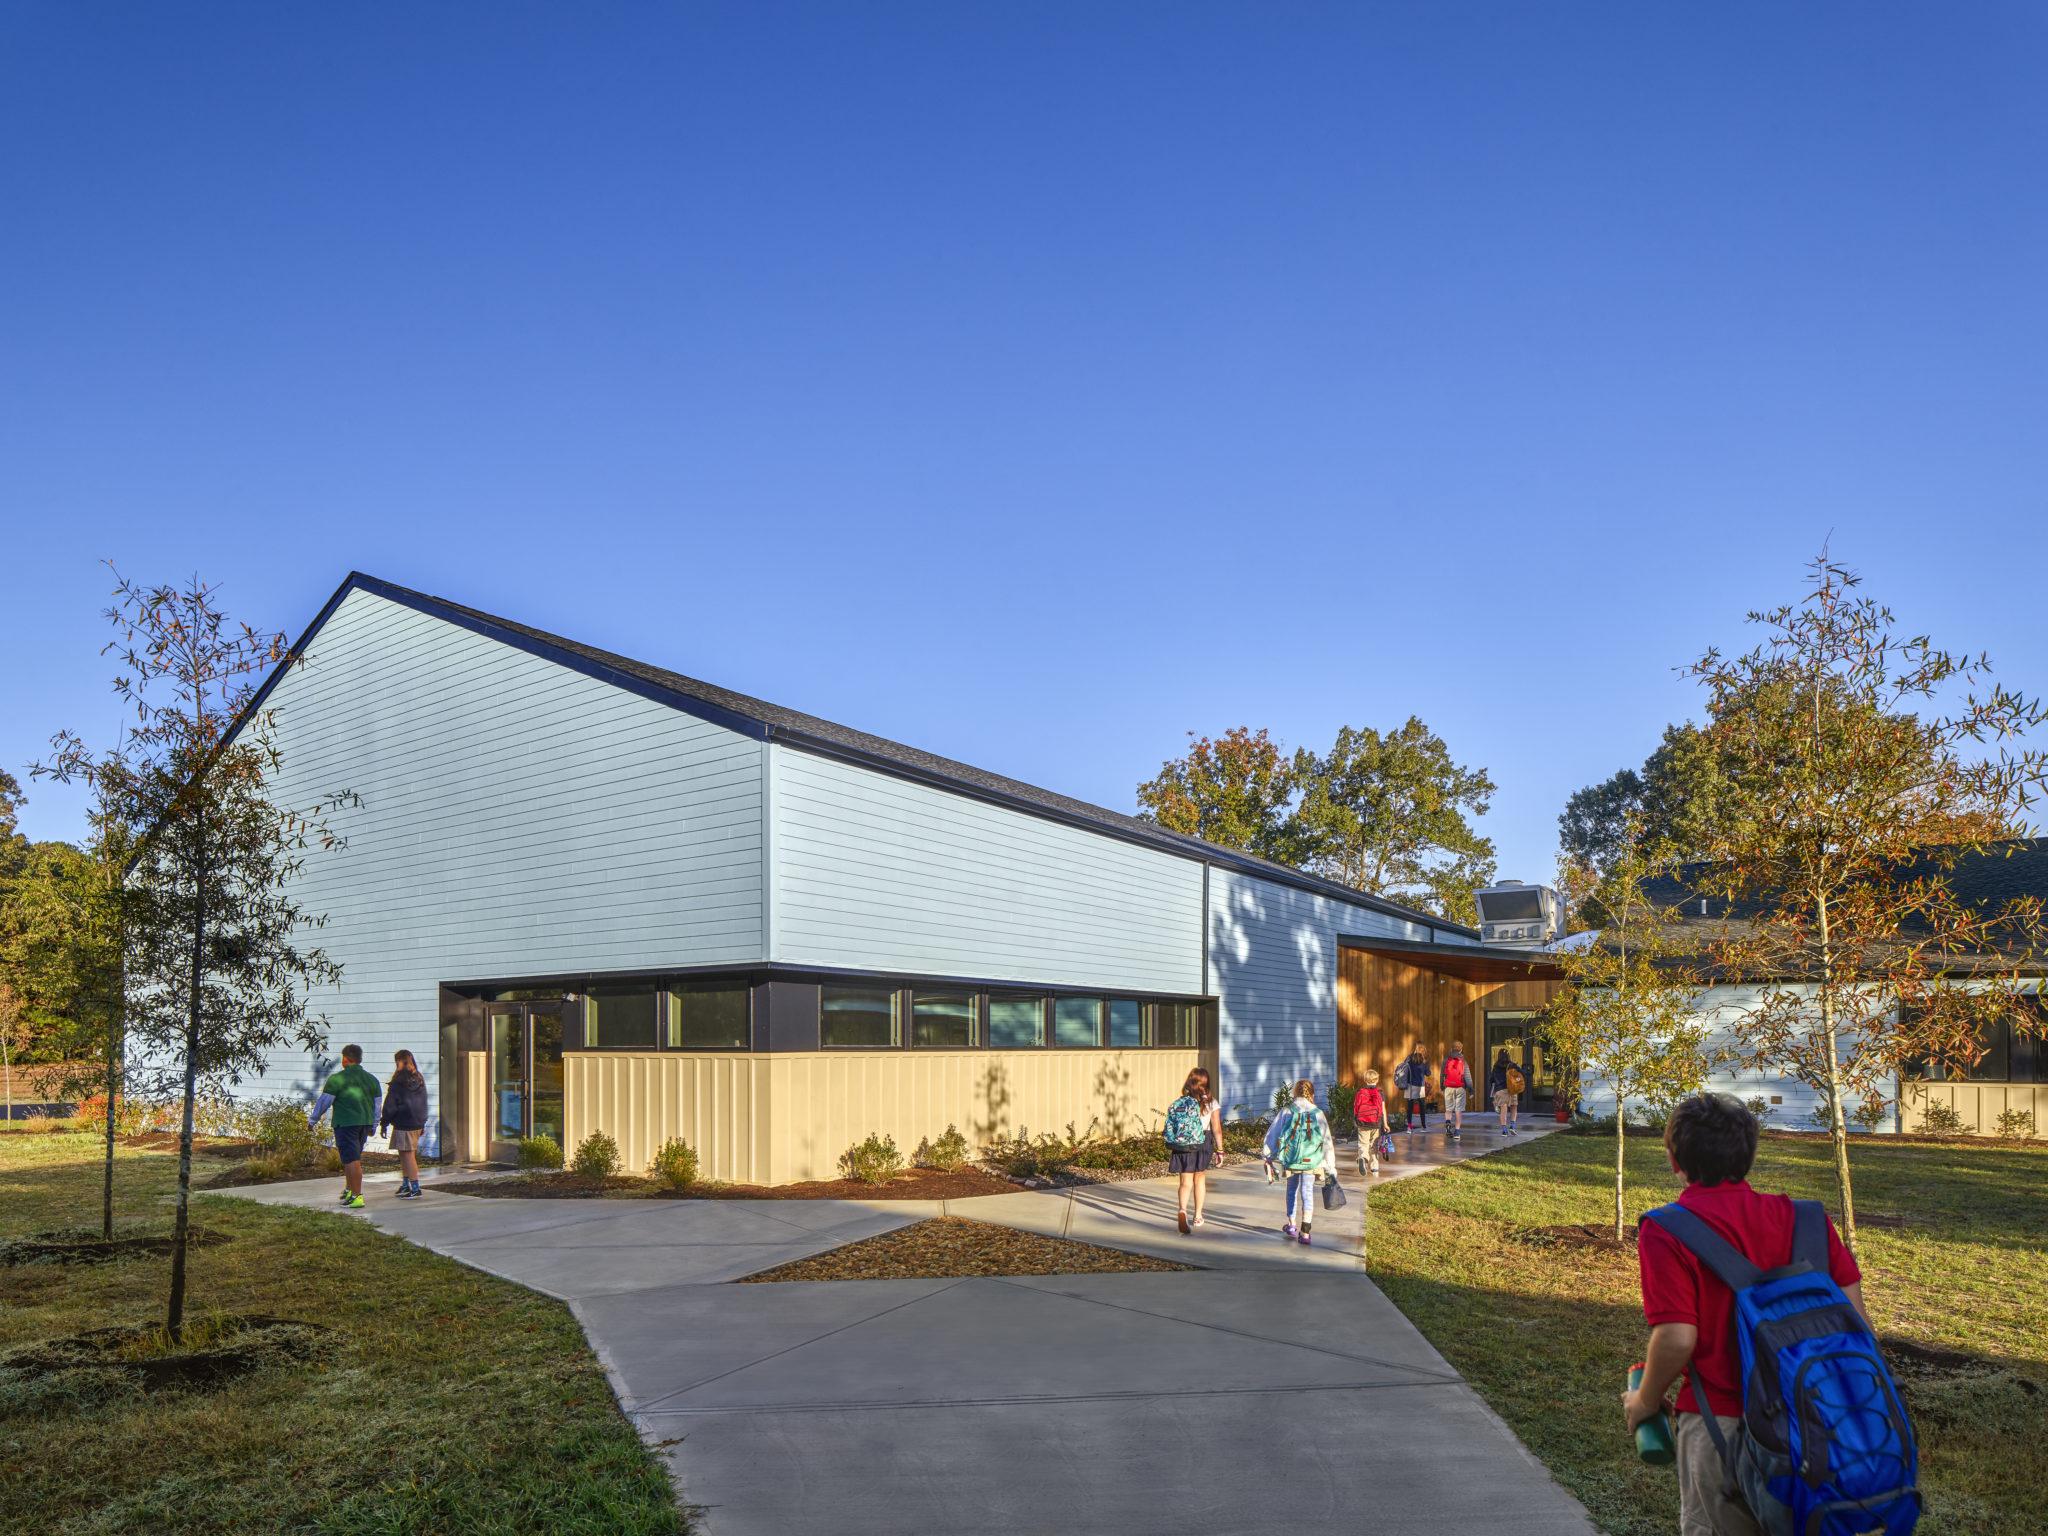 The Jefferson School Middle School Building